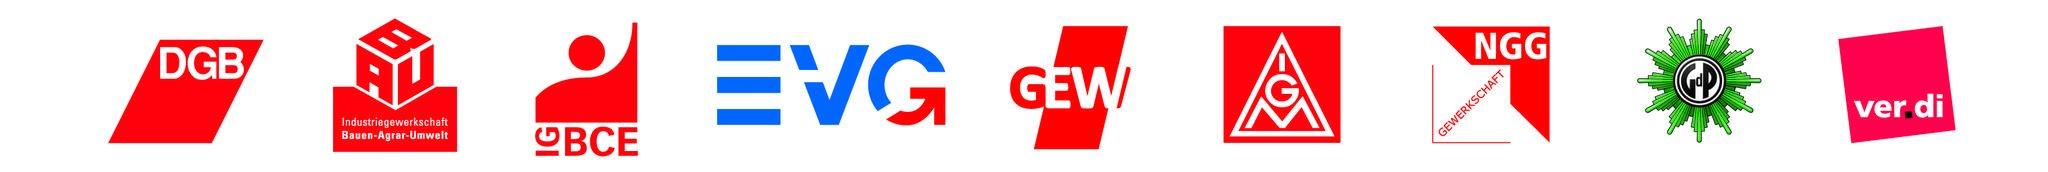 Logoleiste der Gewerkschaften